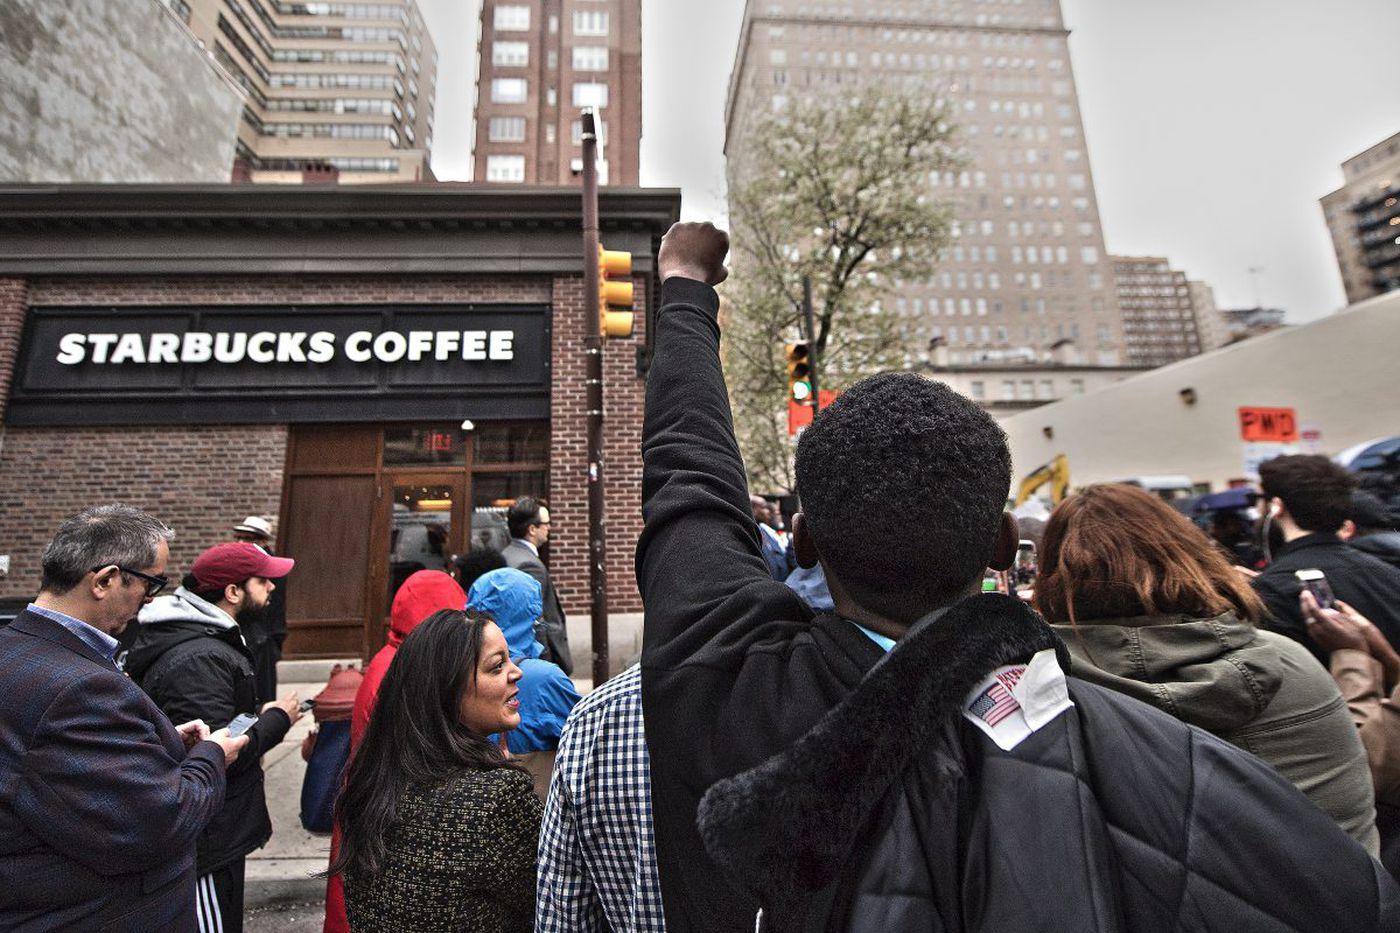 Nationwide Starbucks boycott is the best way to fight back against racist practices | Solomon Jones